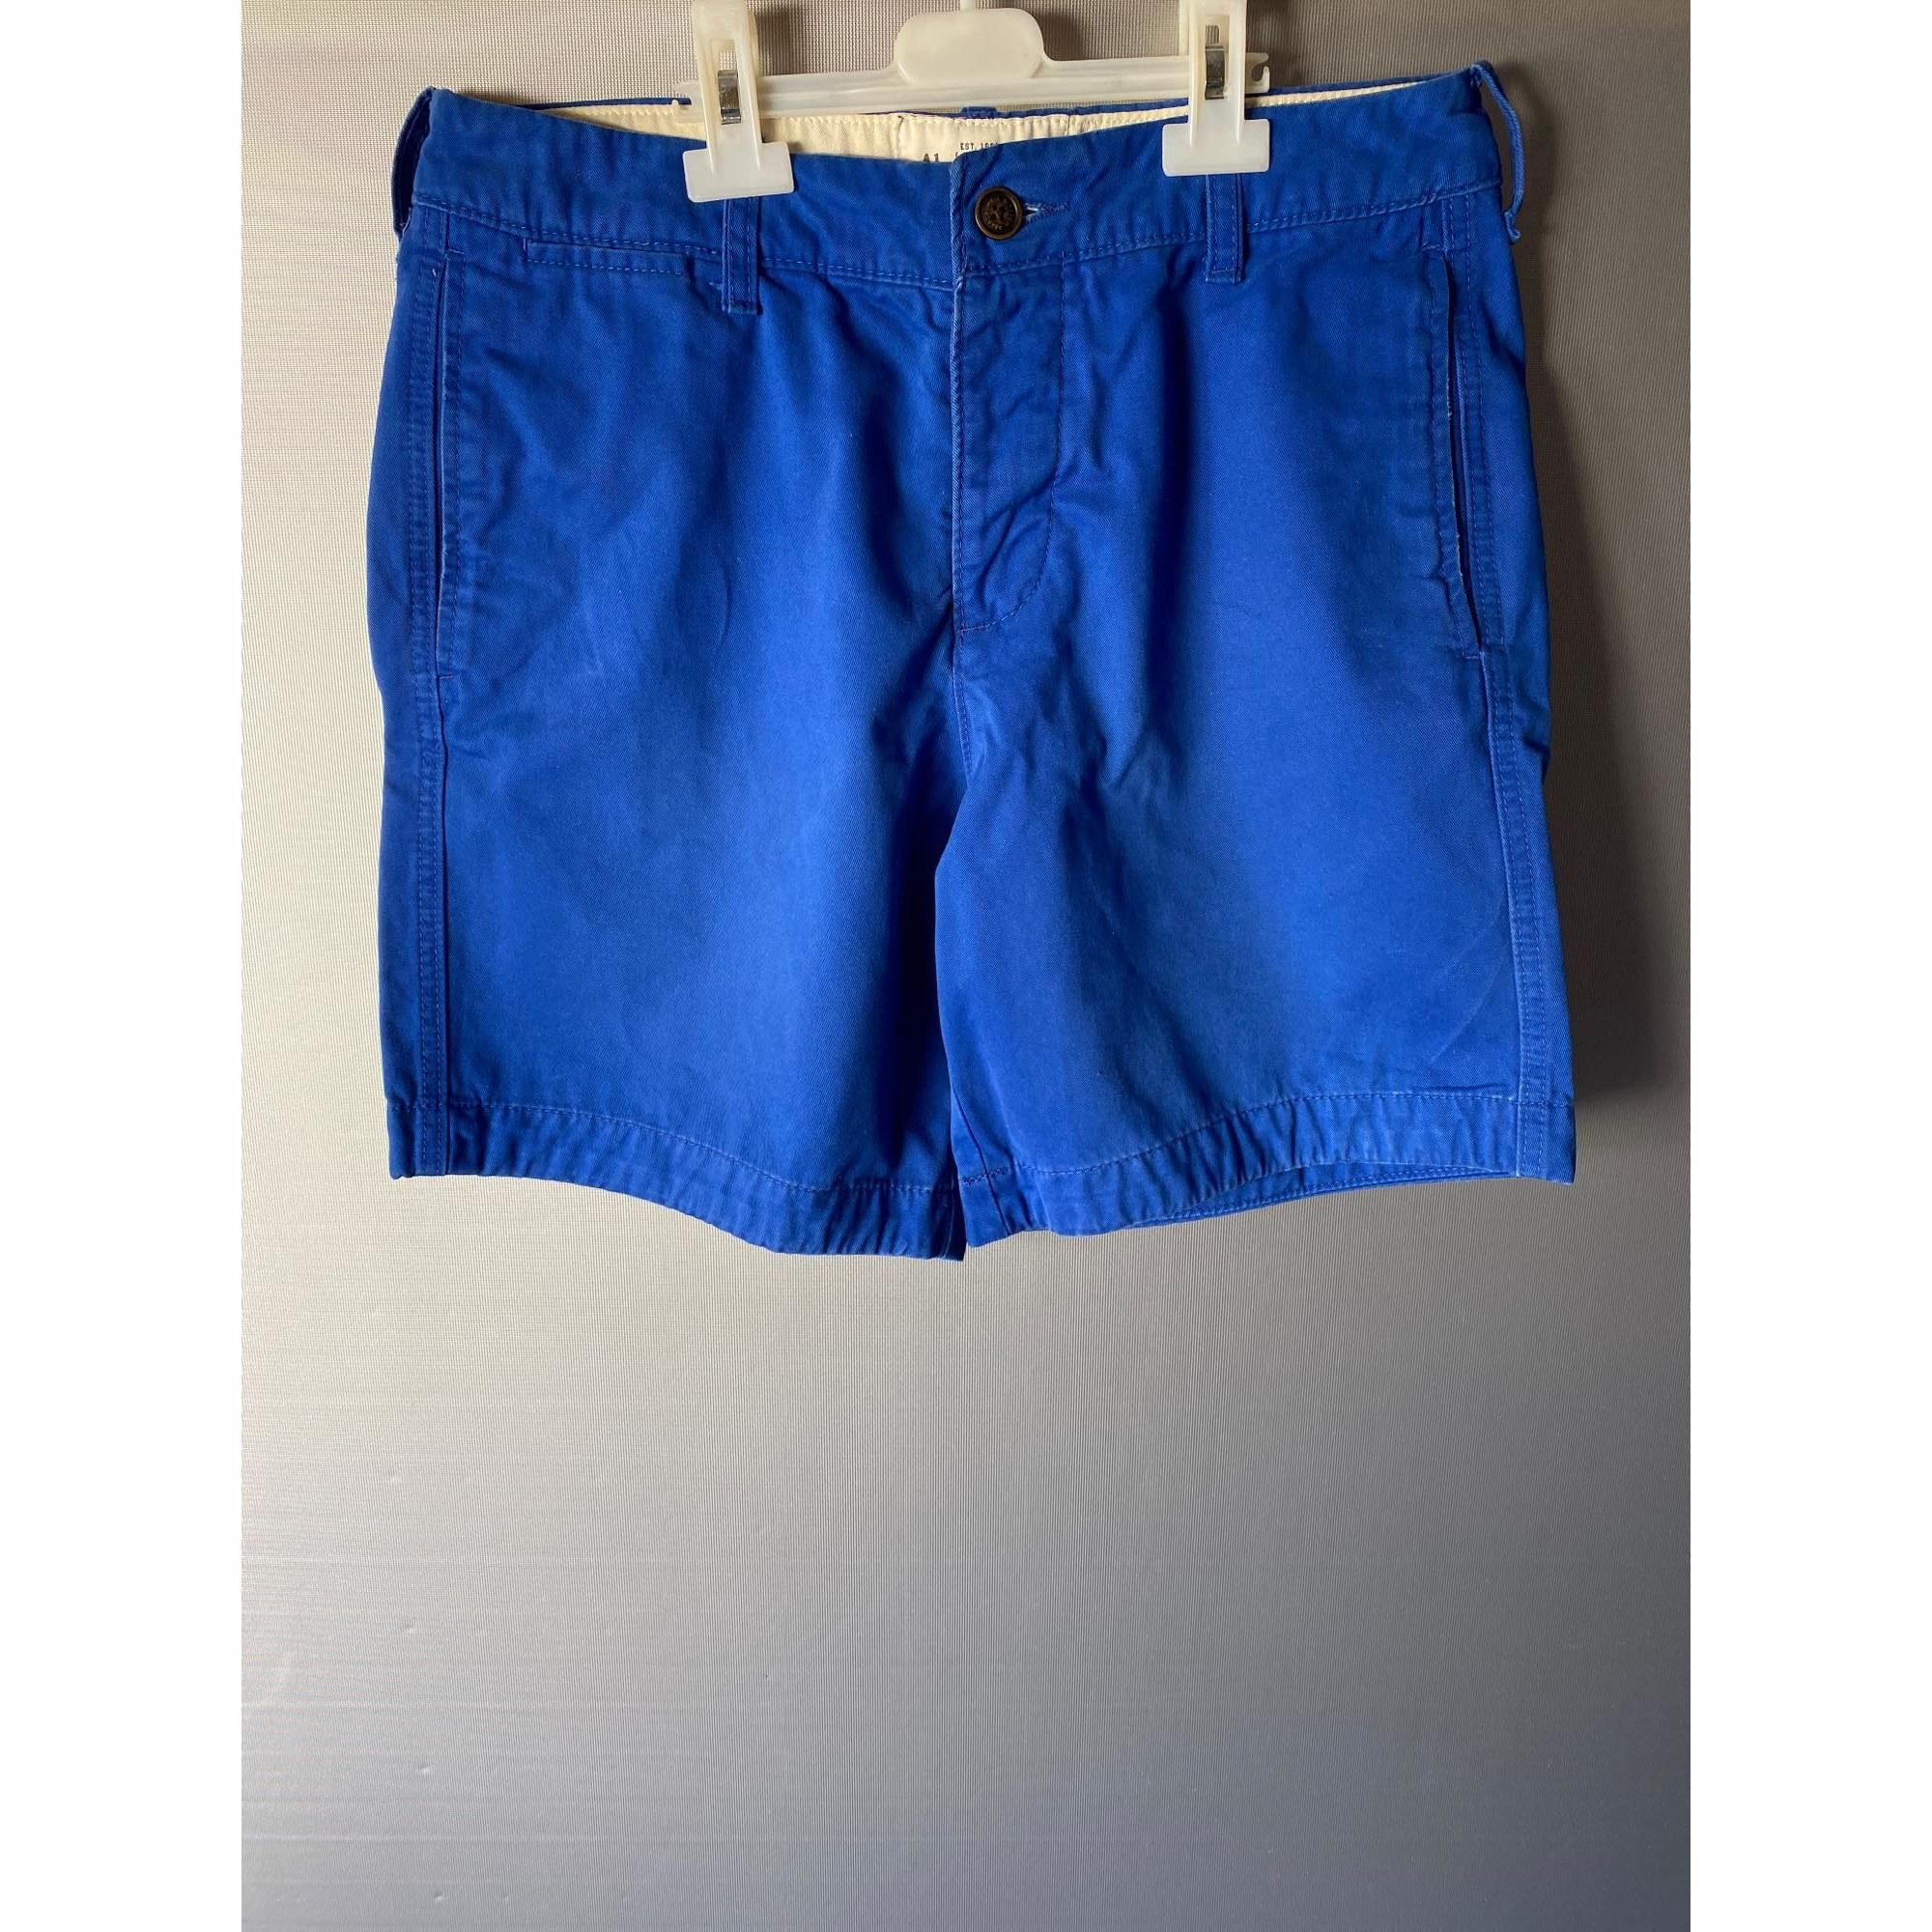 Short ABERCROMBIE & FITCH Bleu, bleu marine, bleu turquoise